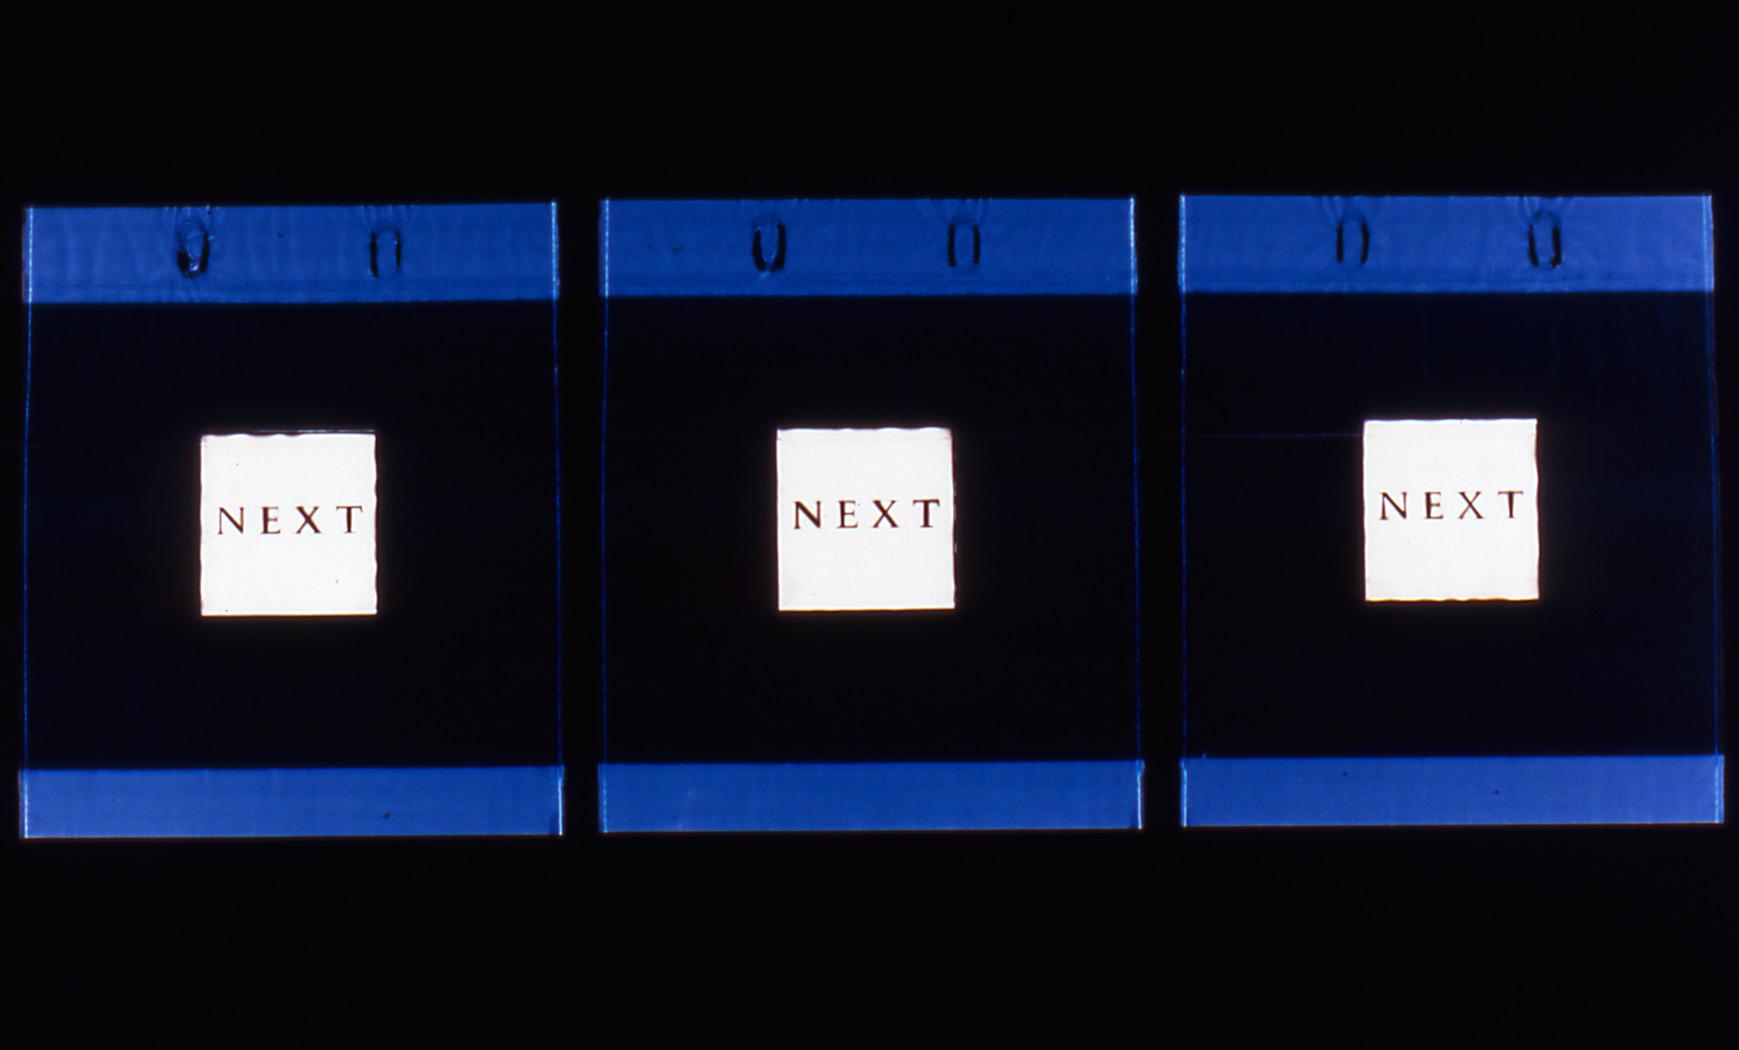 Vaughn Judge   Next, Next, Next , 2002  photogram  30 x 40 inches